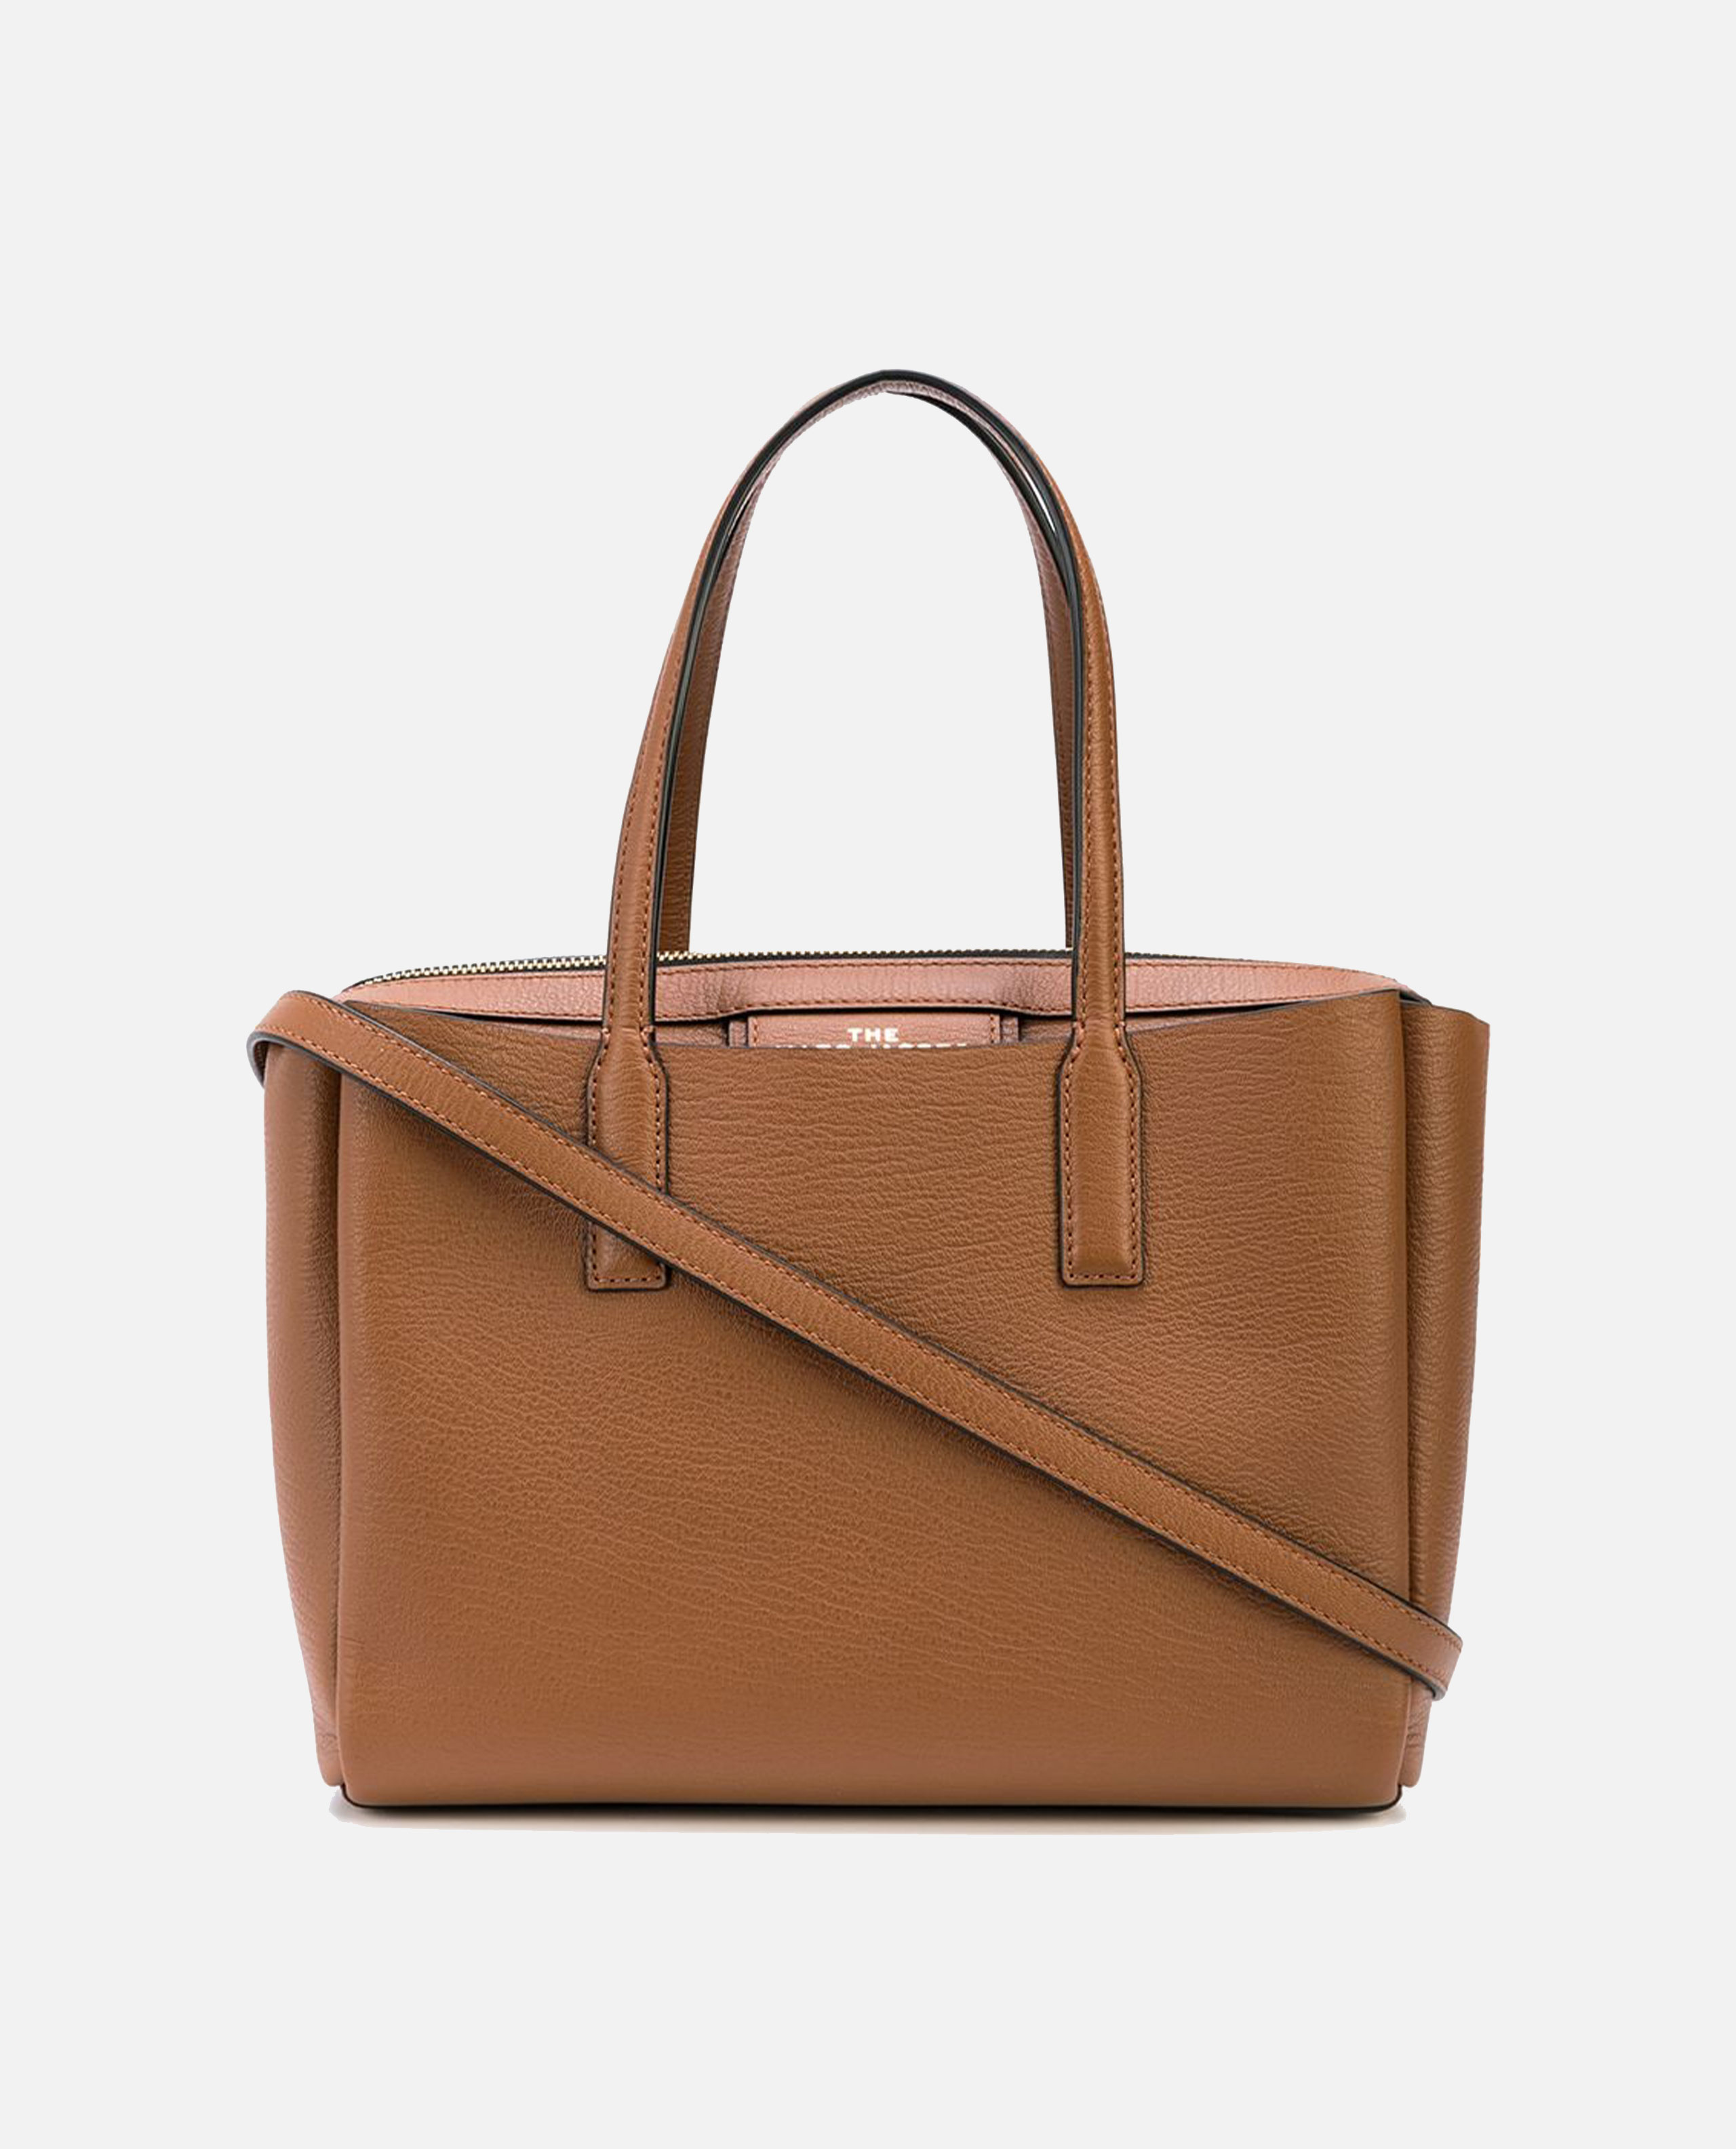 The Mini Protege tote bag